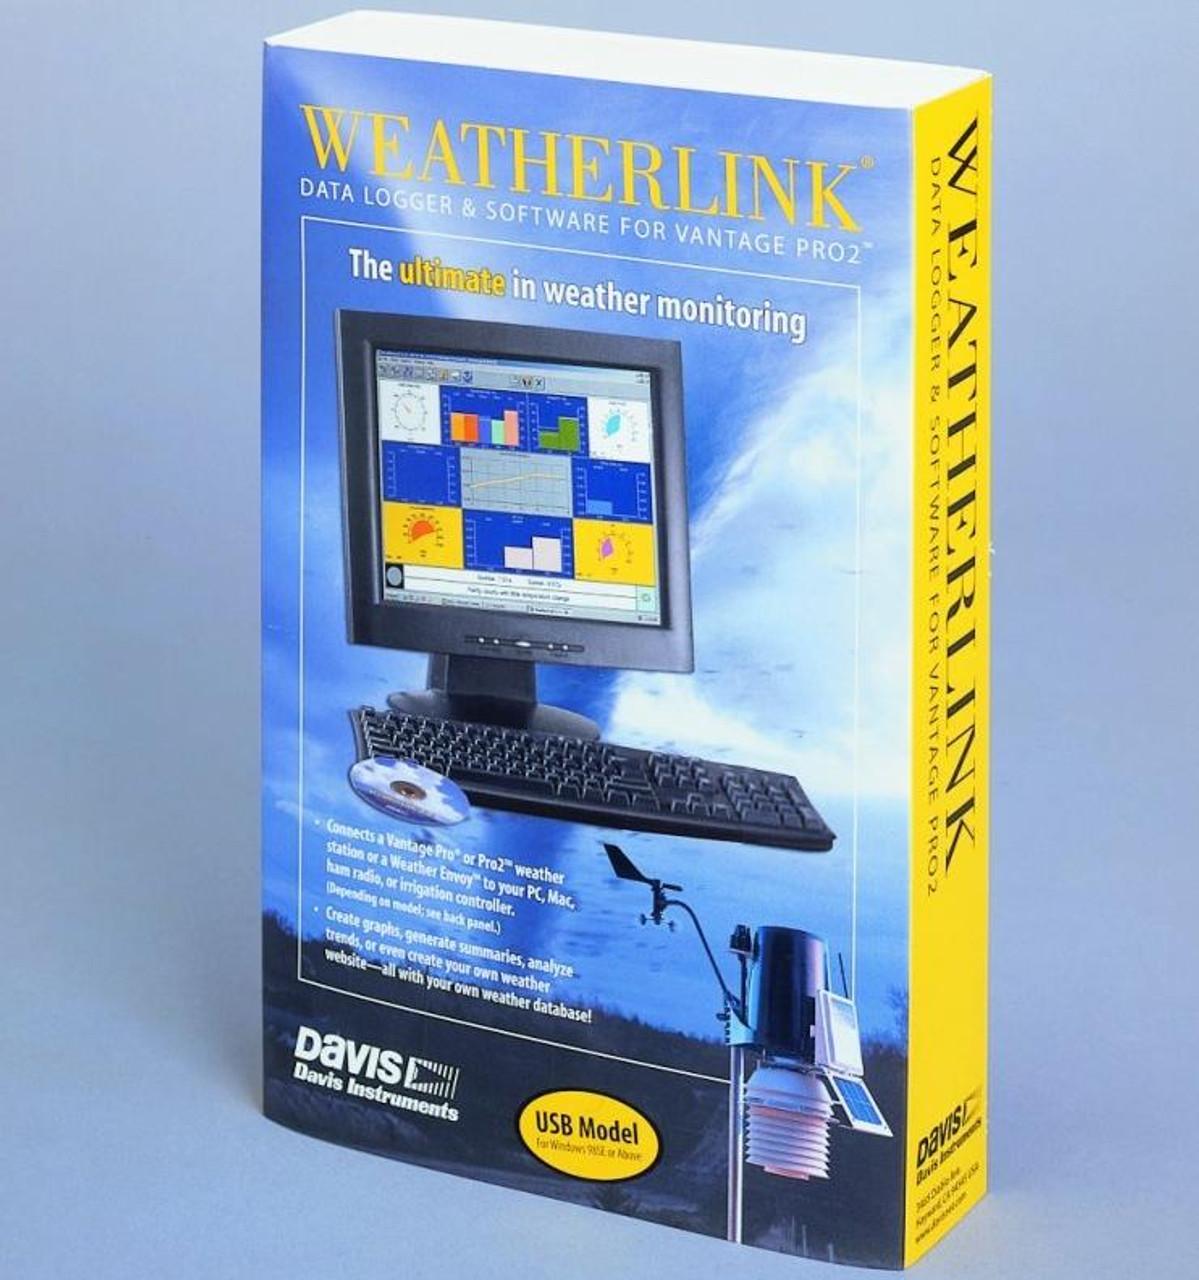 Davis 6510USB WeatherLink USB for Vantage Pro, Pro2 and Vue Windows/PC